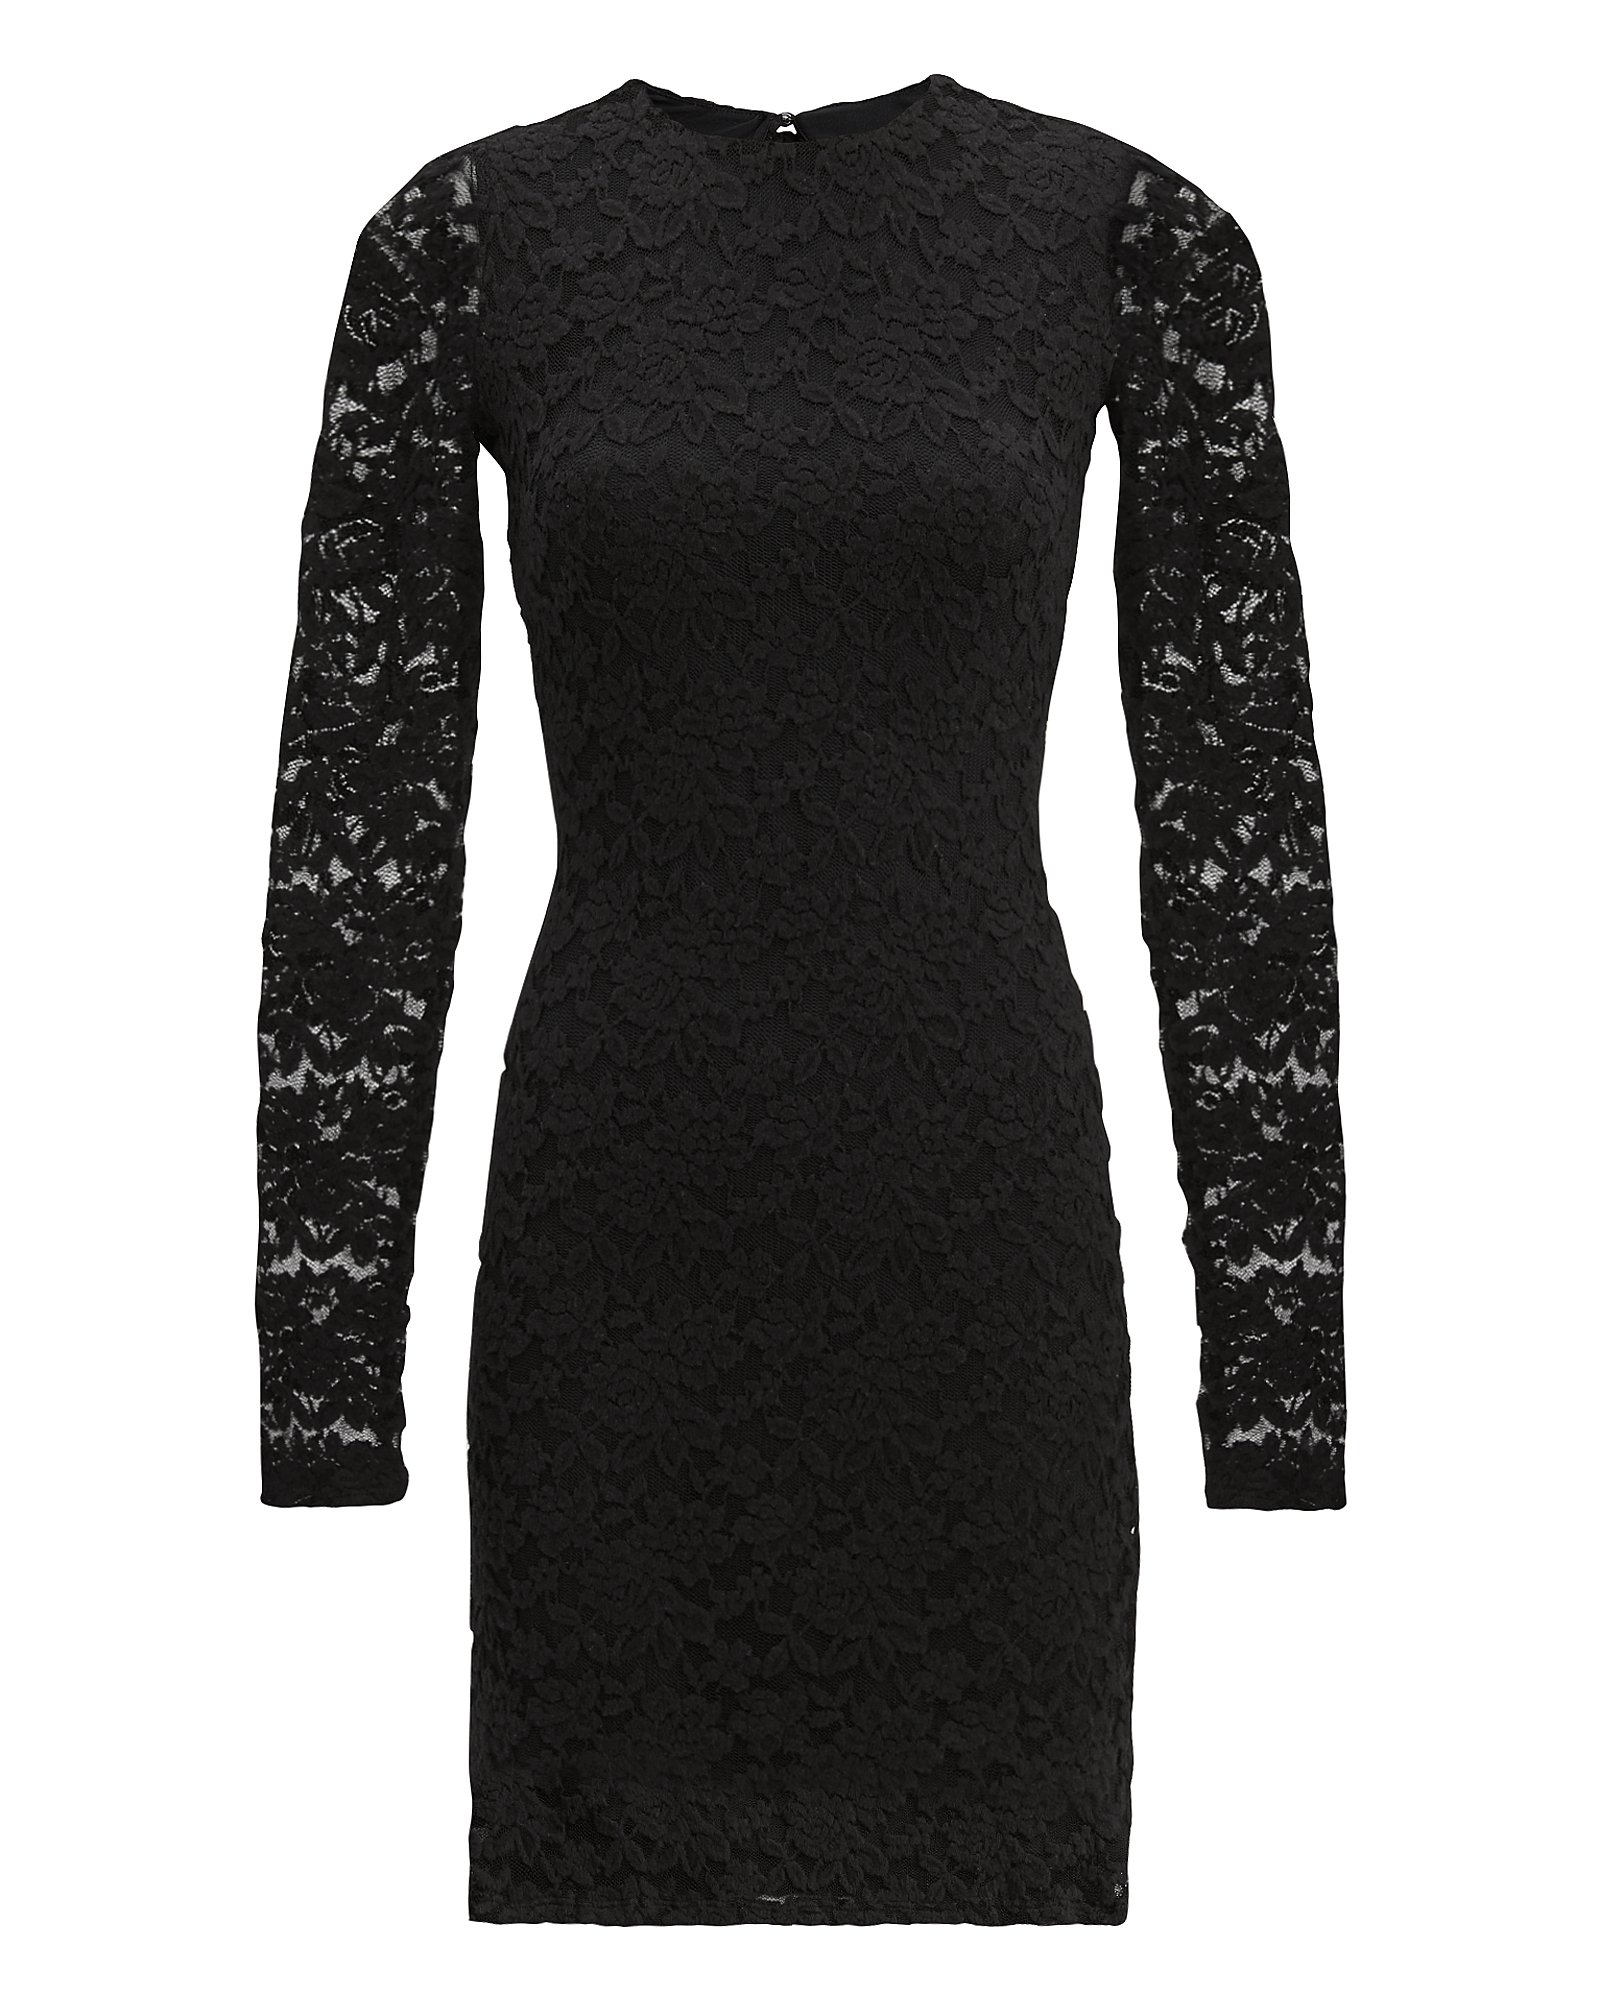 NIGHTCAP CLOTHING Black Sweater Lace Dress